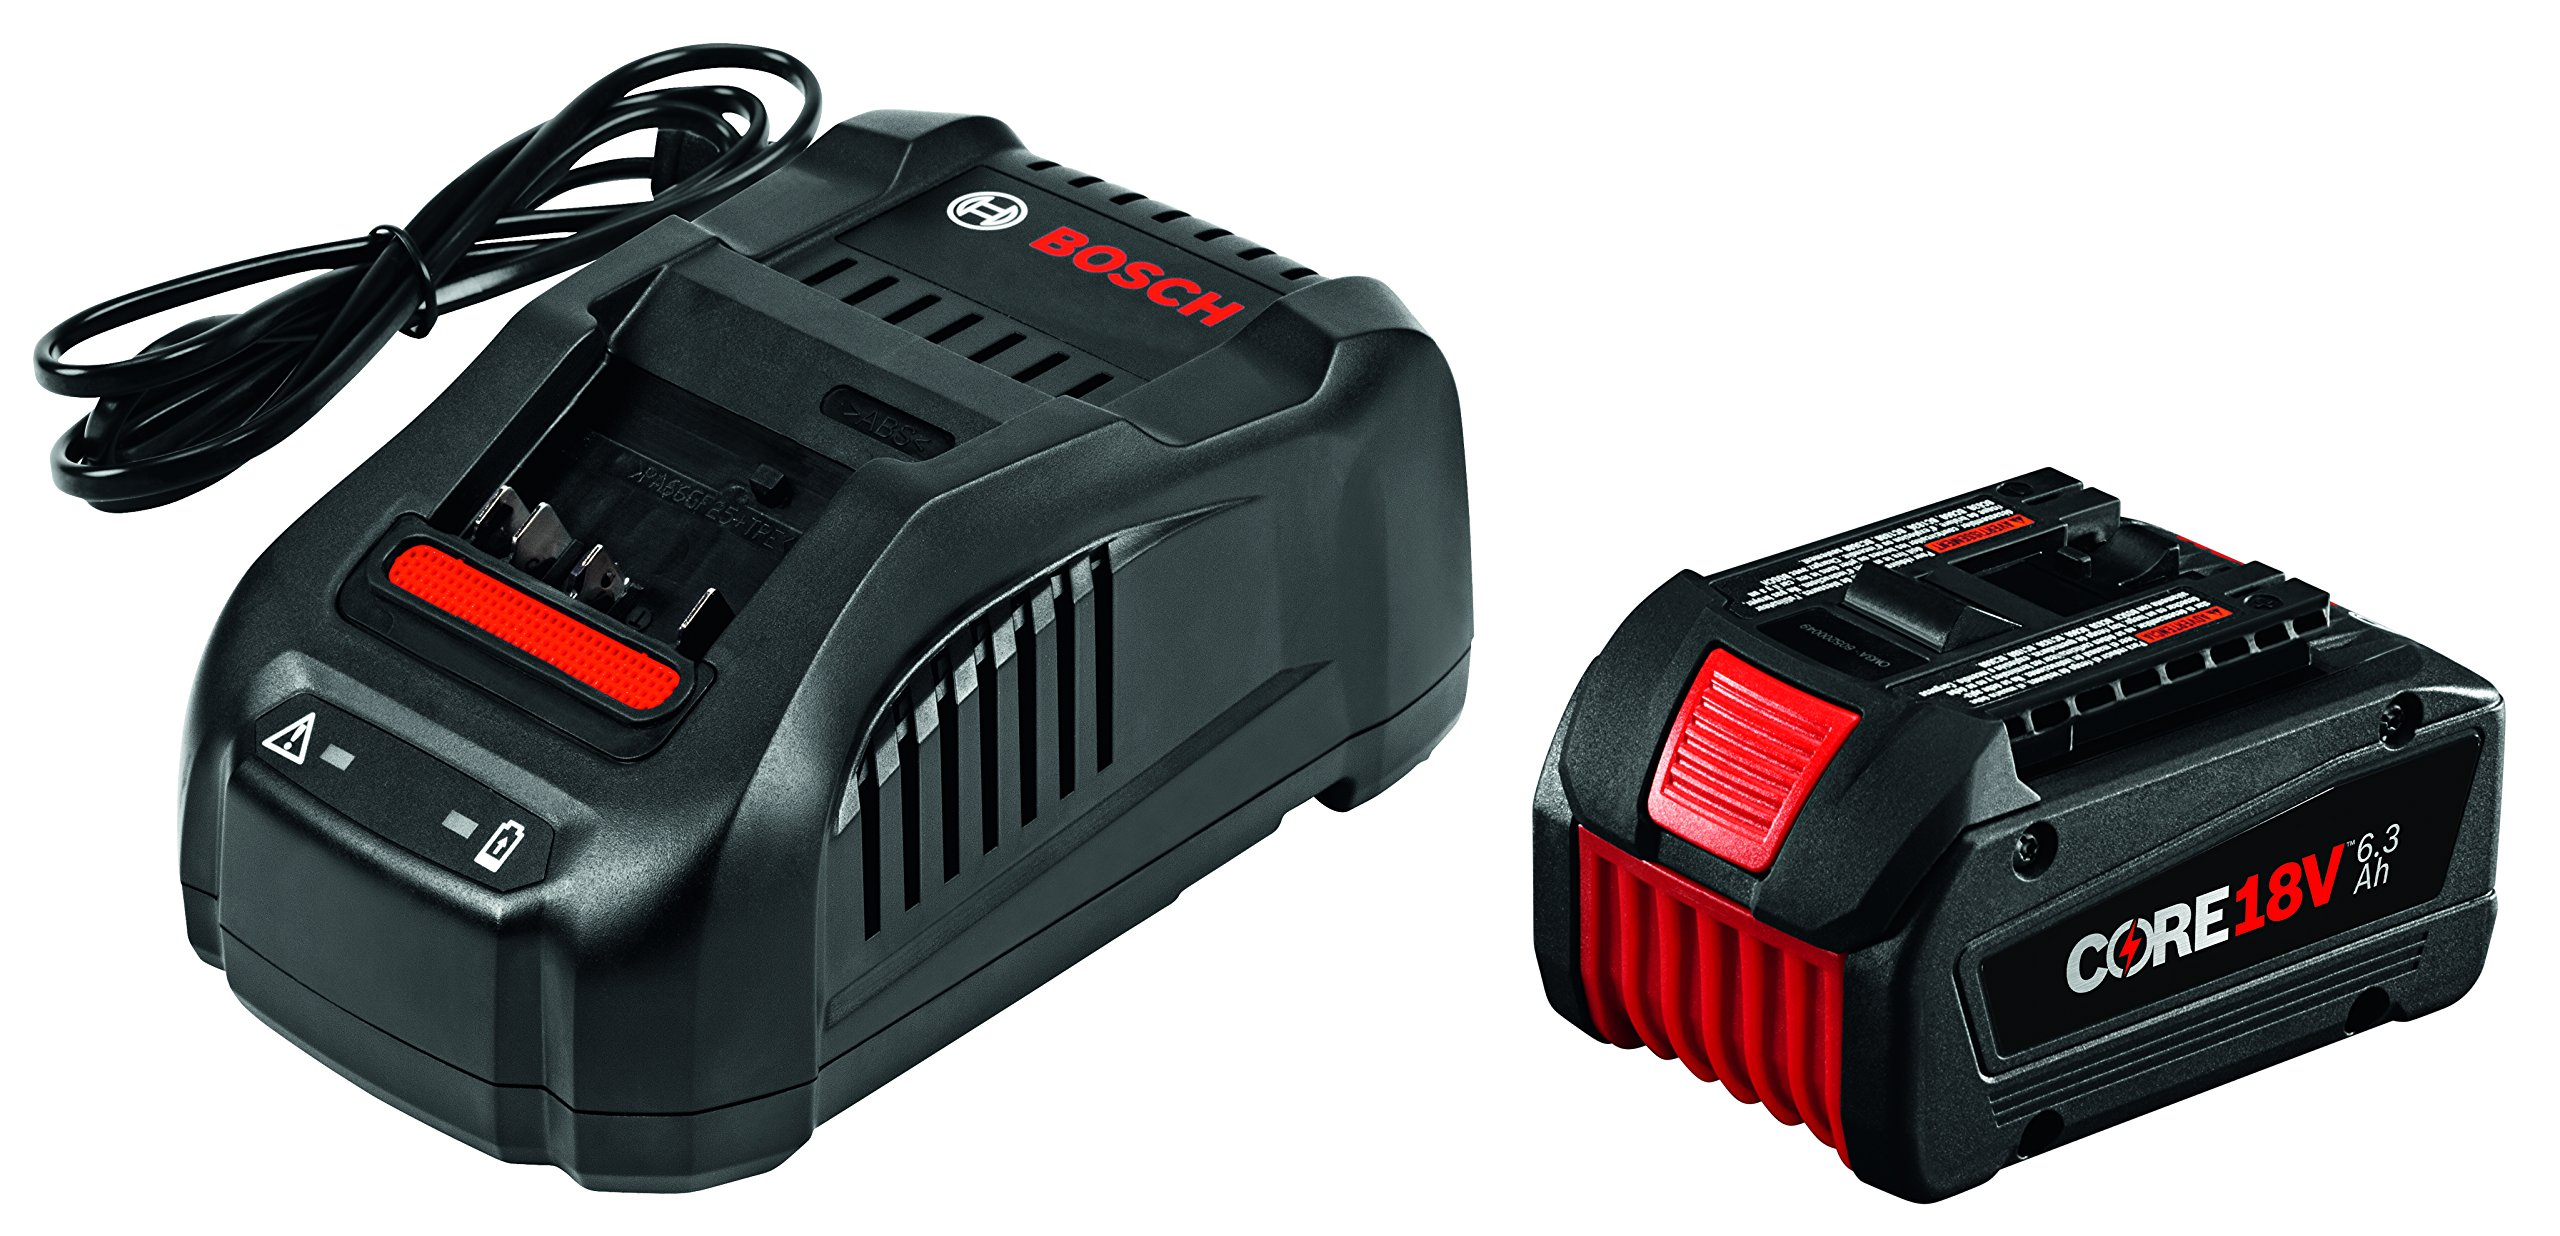 Bosch 18V Starter Kit with CORE18V Battery and Charger GXS18V-01N14,Black